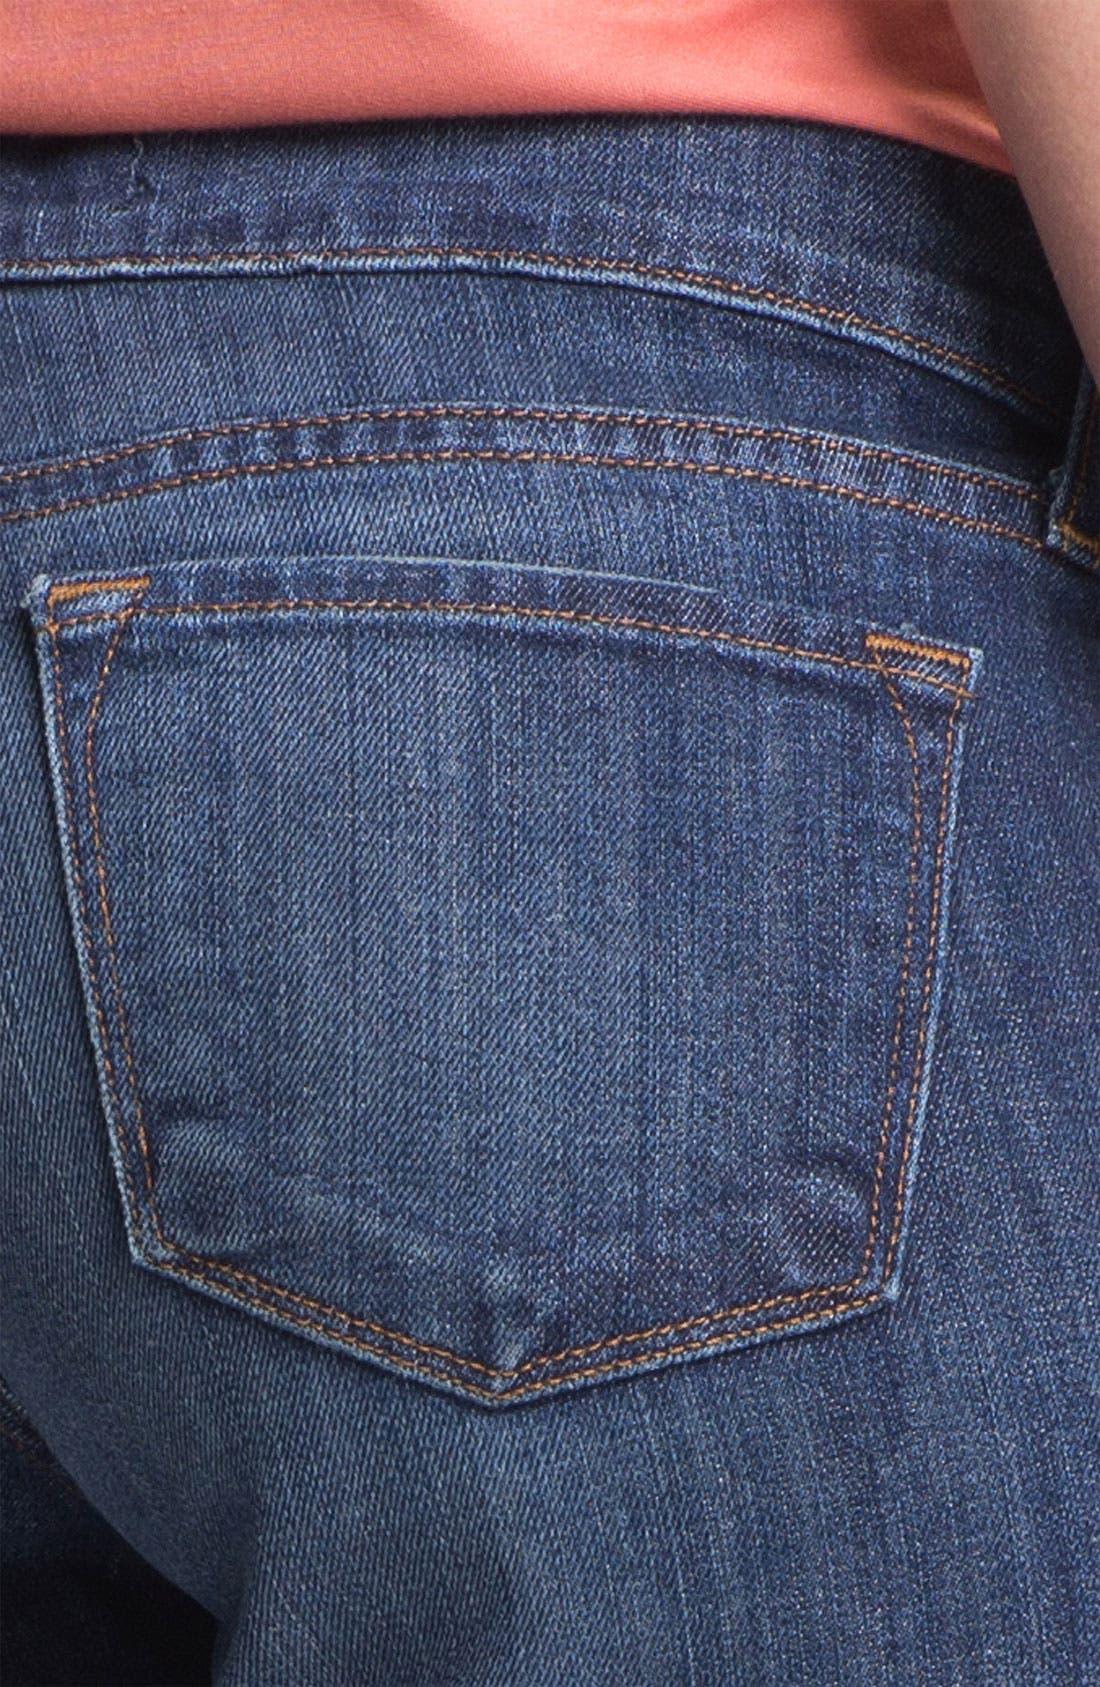 Alternate Image 3  - J Brand 'Midori' Destroyed Boyfriend Jeans (Big Time)